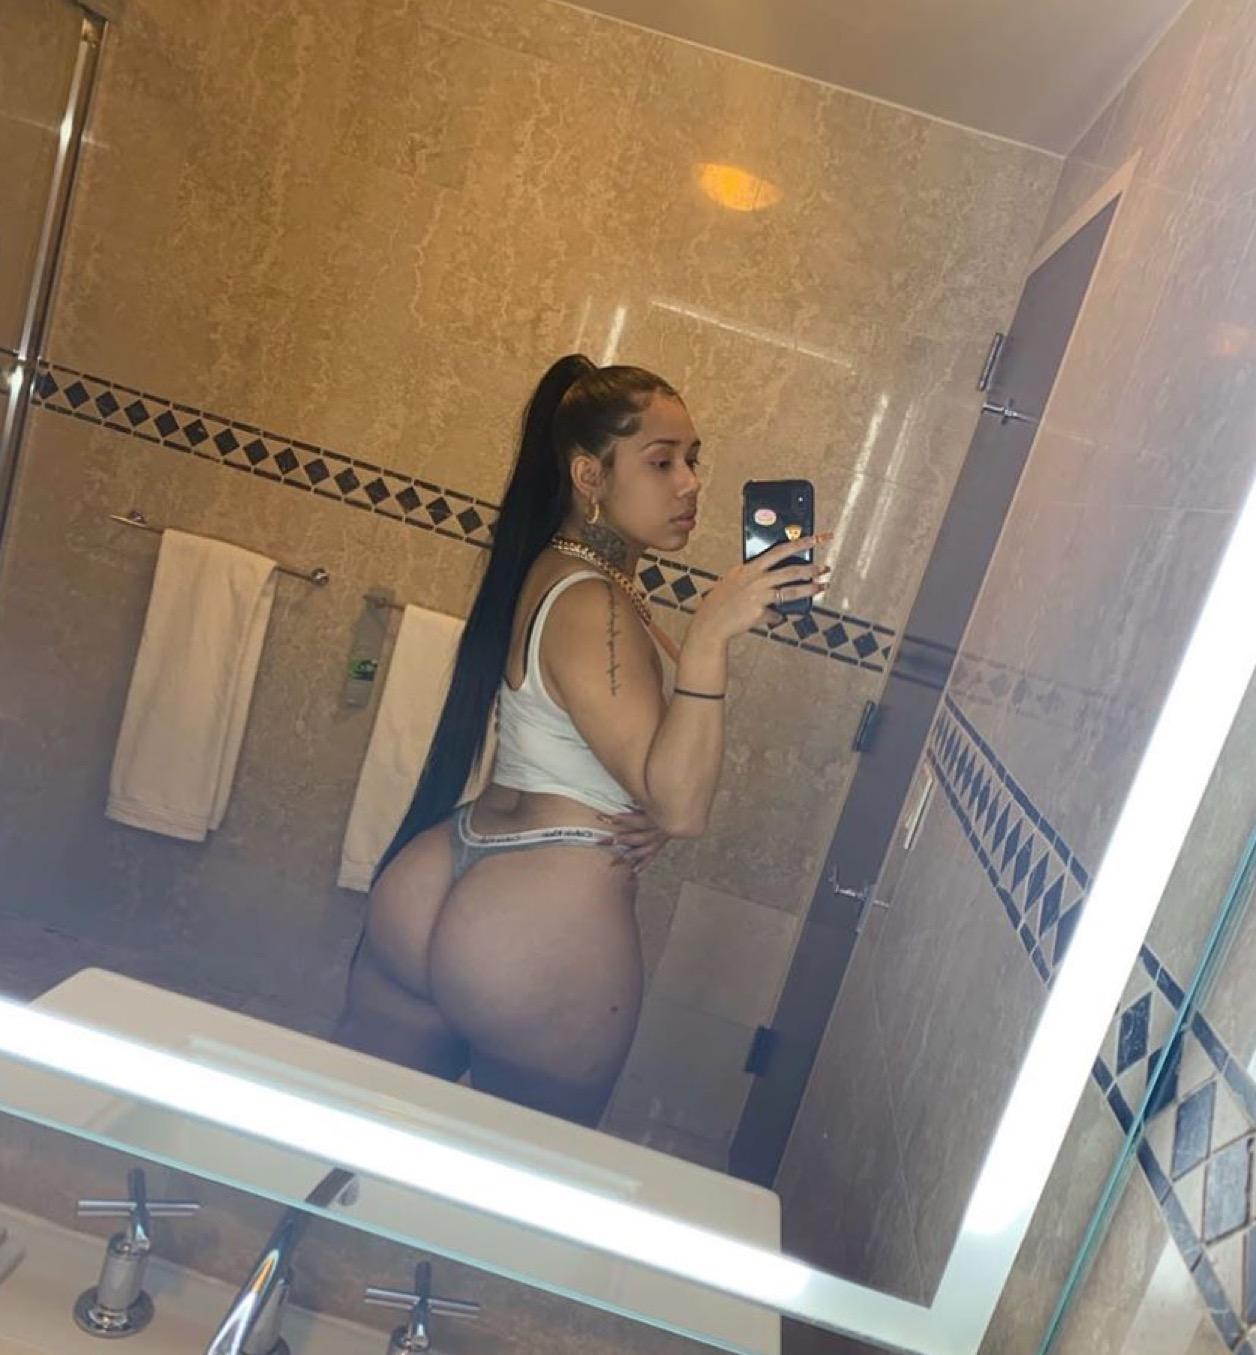 Sara Molina Nude & Sex Tape 6ix9ine Baby Mama Leaked! 0004